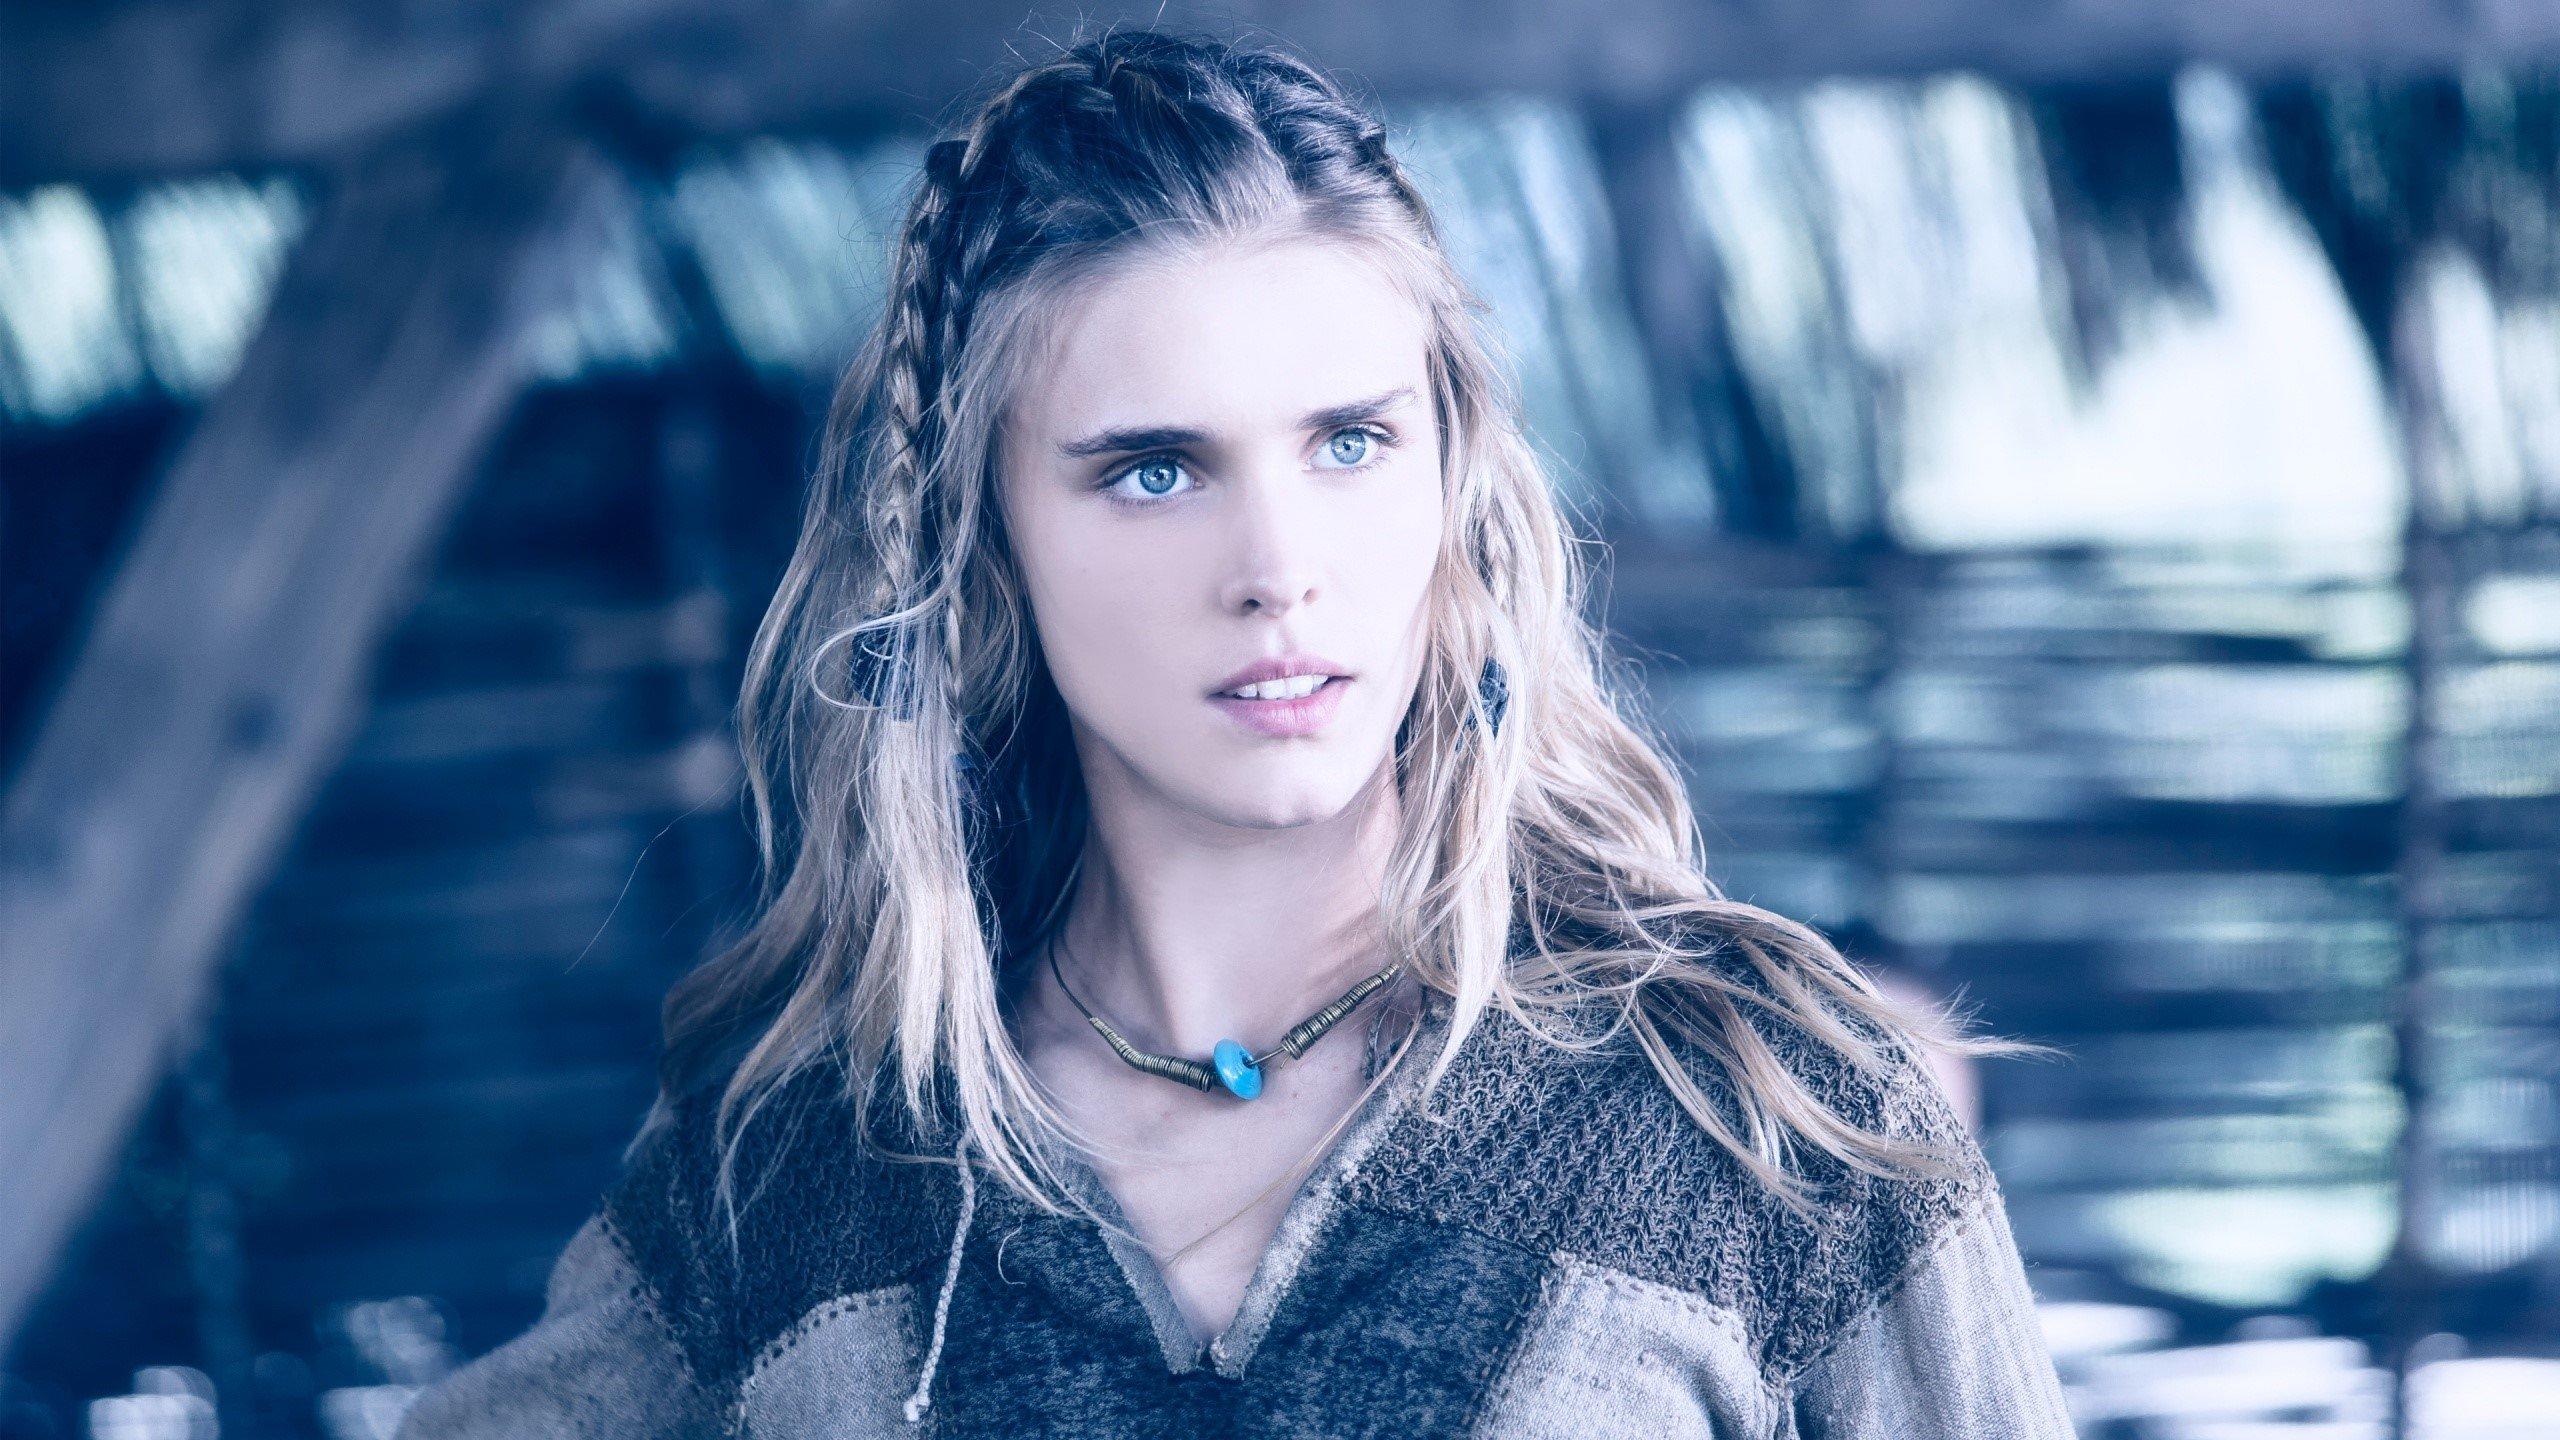 Wallpaper Gaia Weiss of Vikings